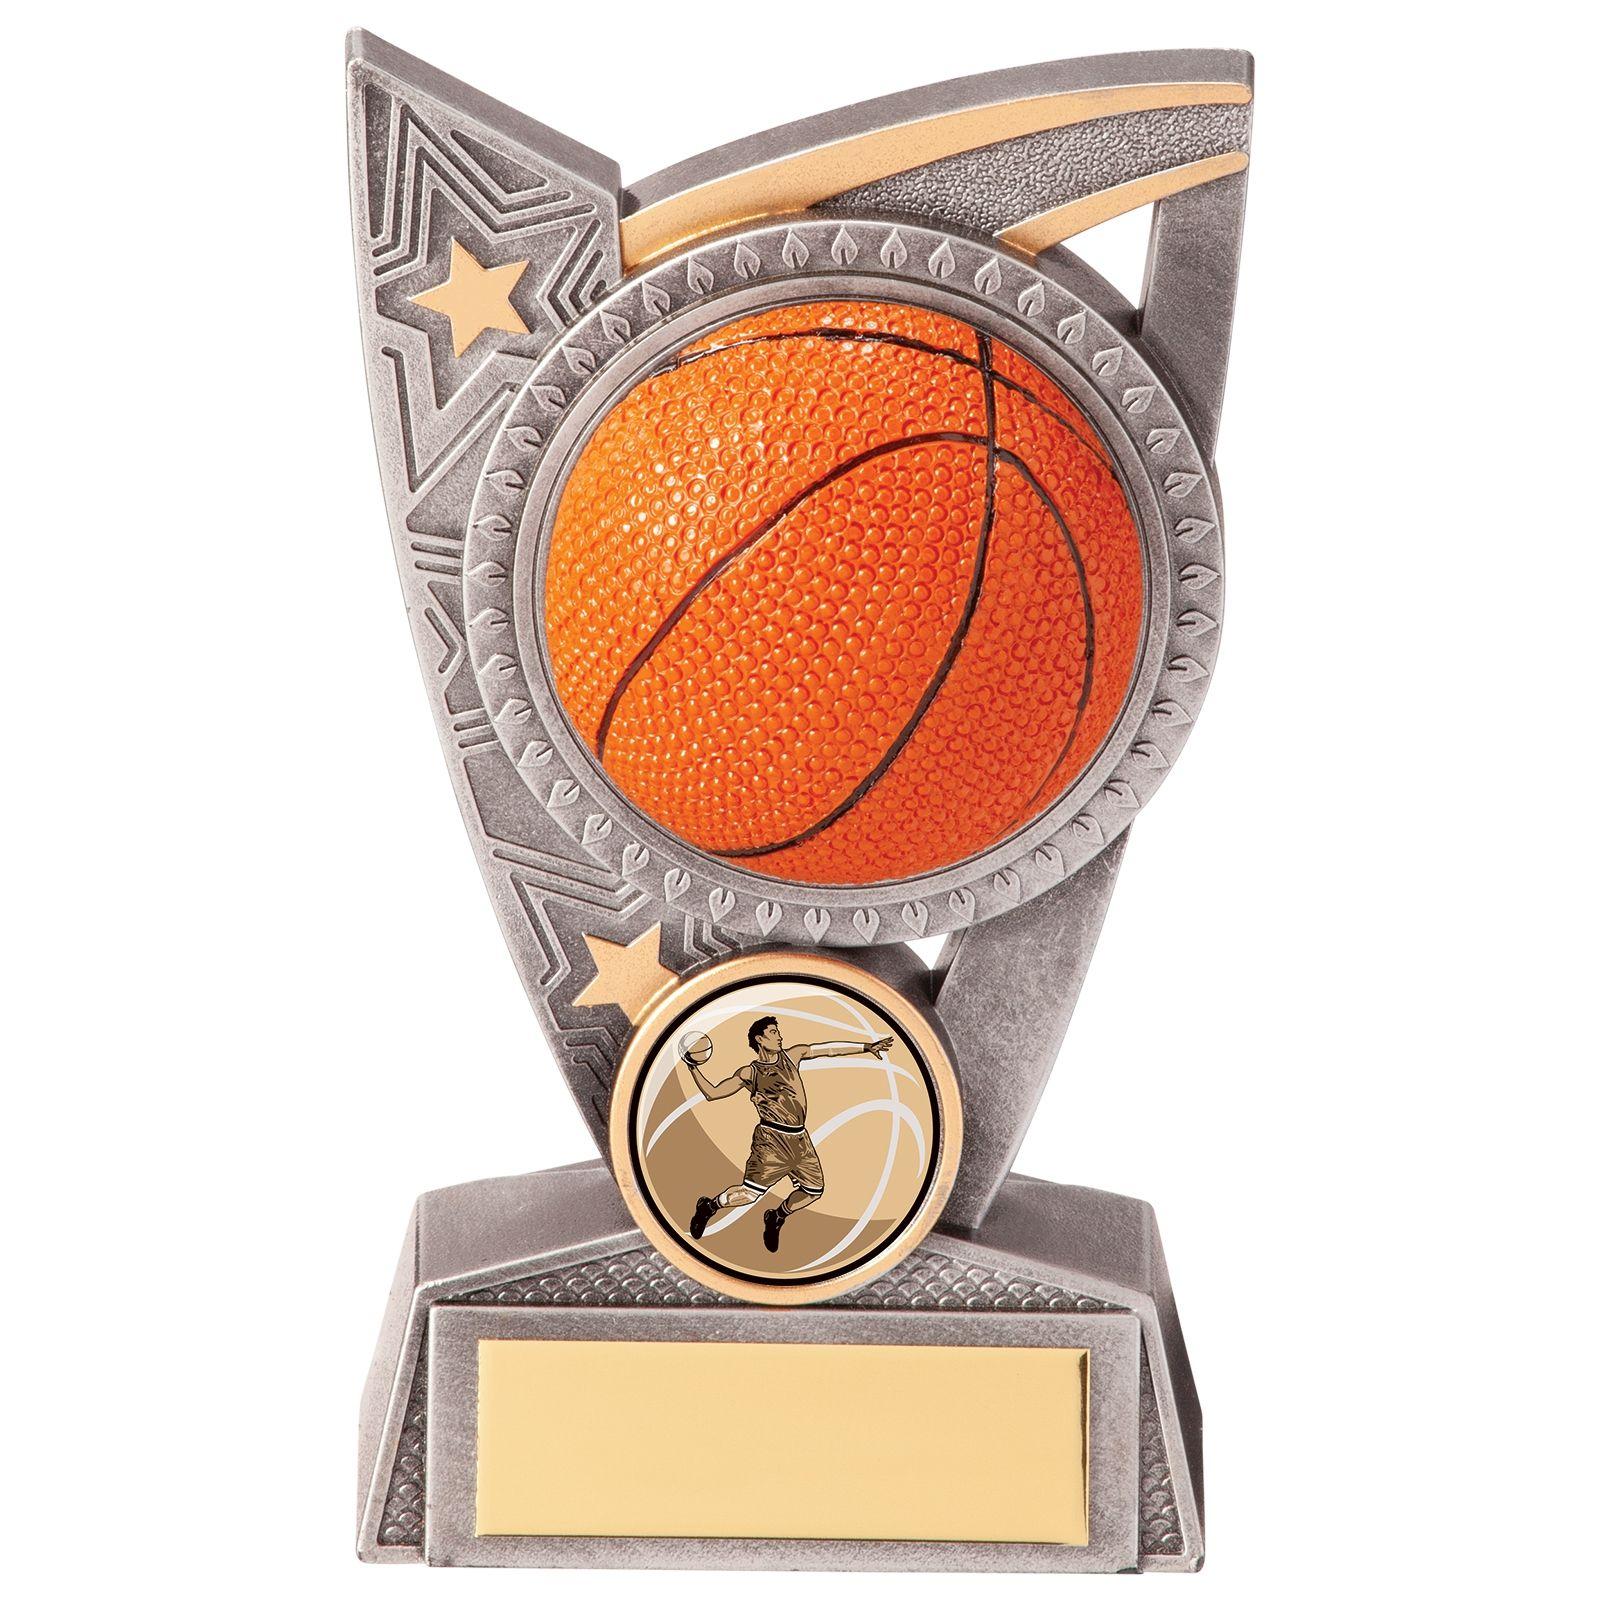 Triumph Basketball Trophy Award 125mm New 2020 in 2020